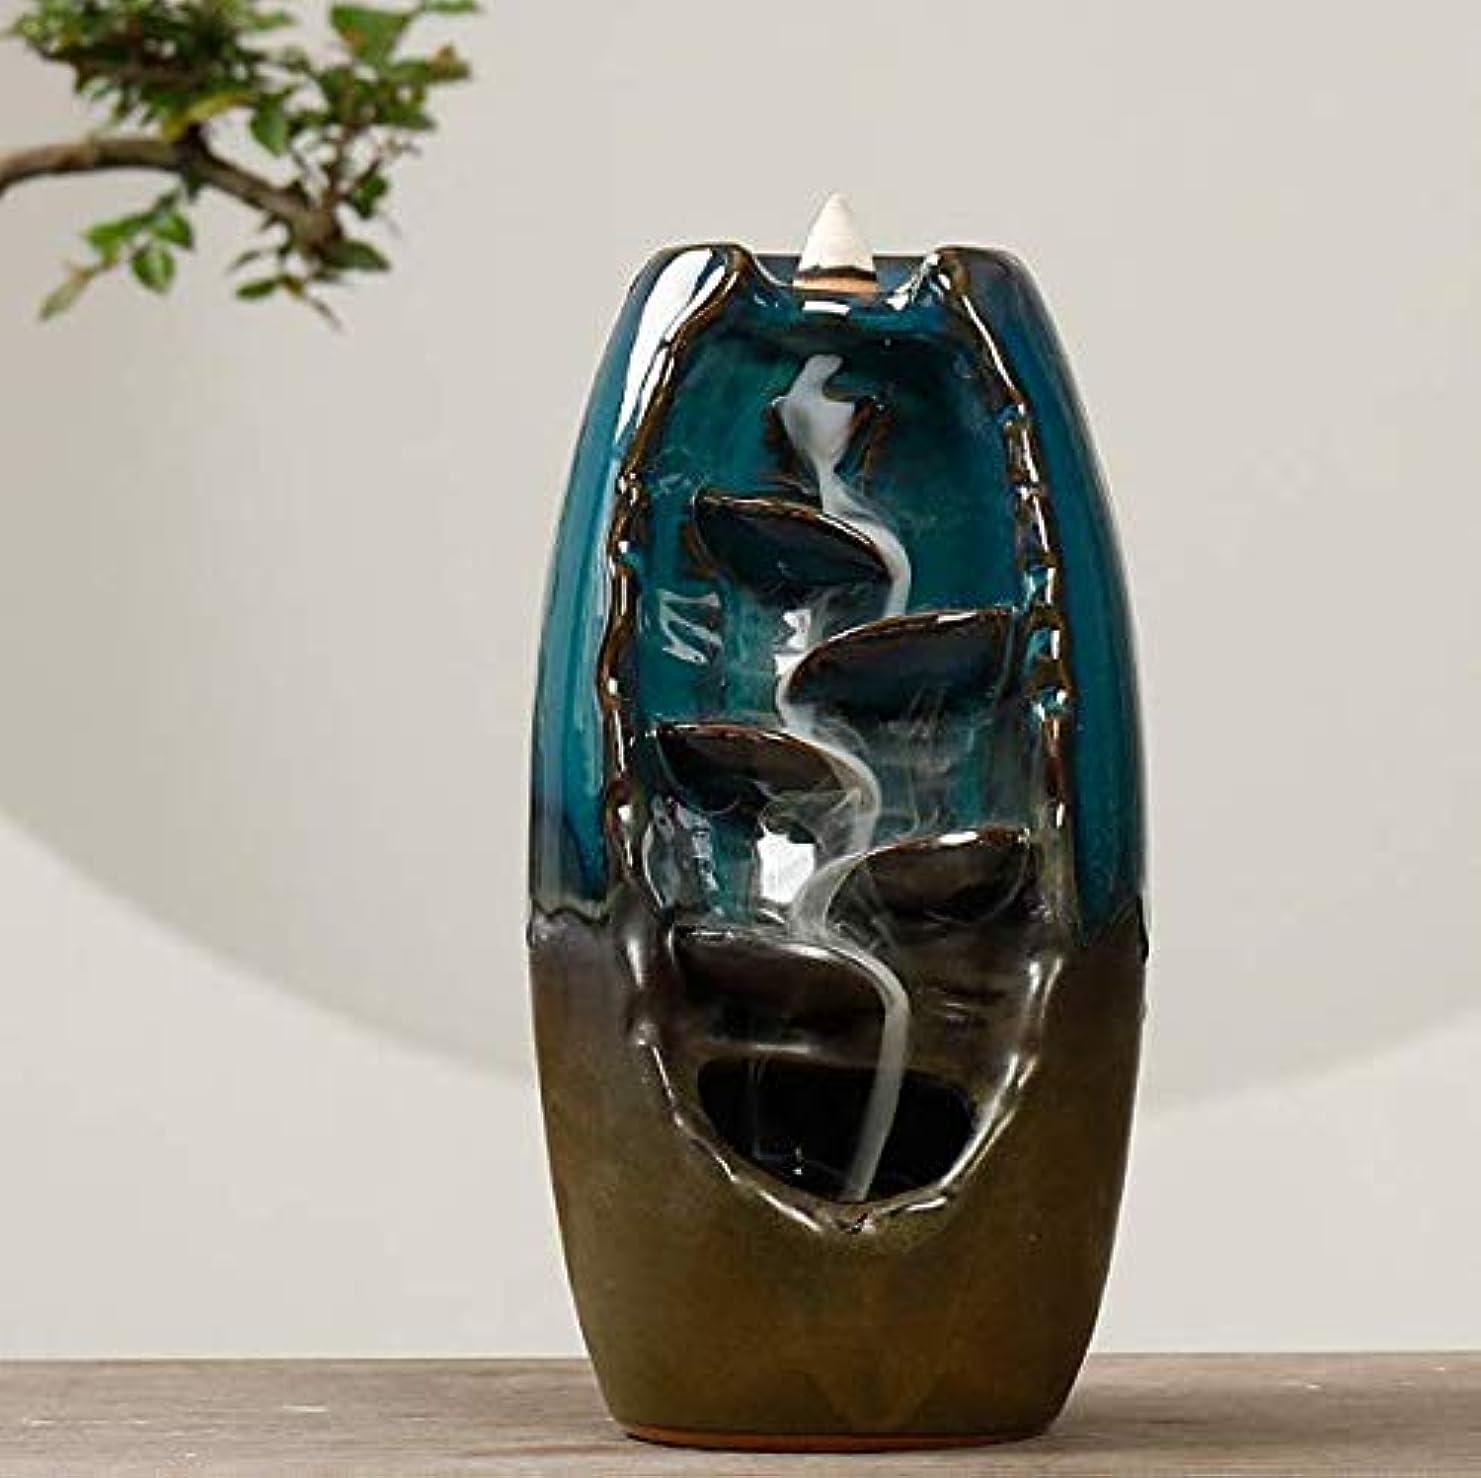 (Baoxinjp)倒流香炉 磁器 セラミックス 金属 蓋 防火 お香用 線香立て 缐香用 盤香用 落ち着く アロマ 陶器 簡潔 レトロ風 高級感 優美な境地 緑